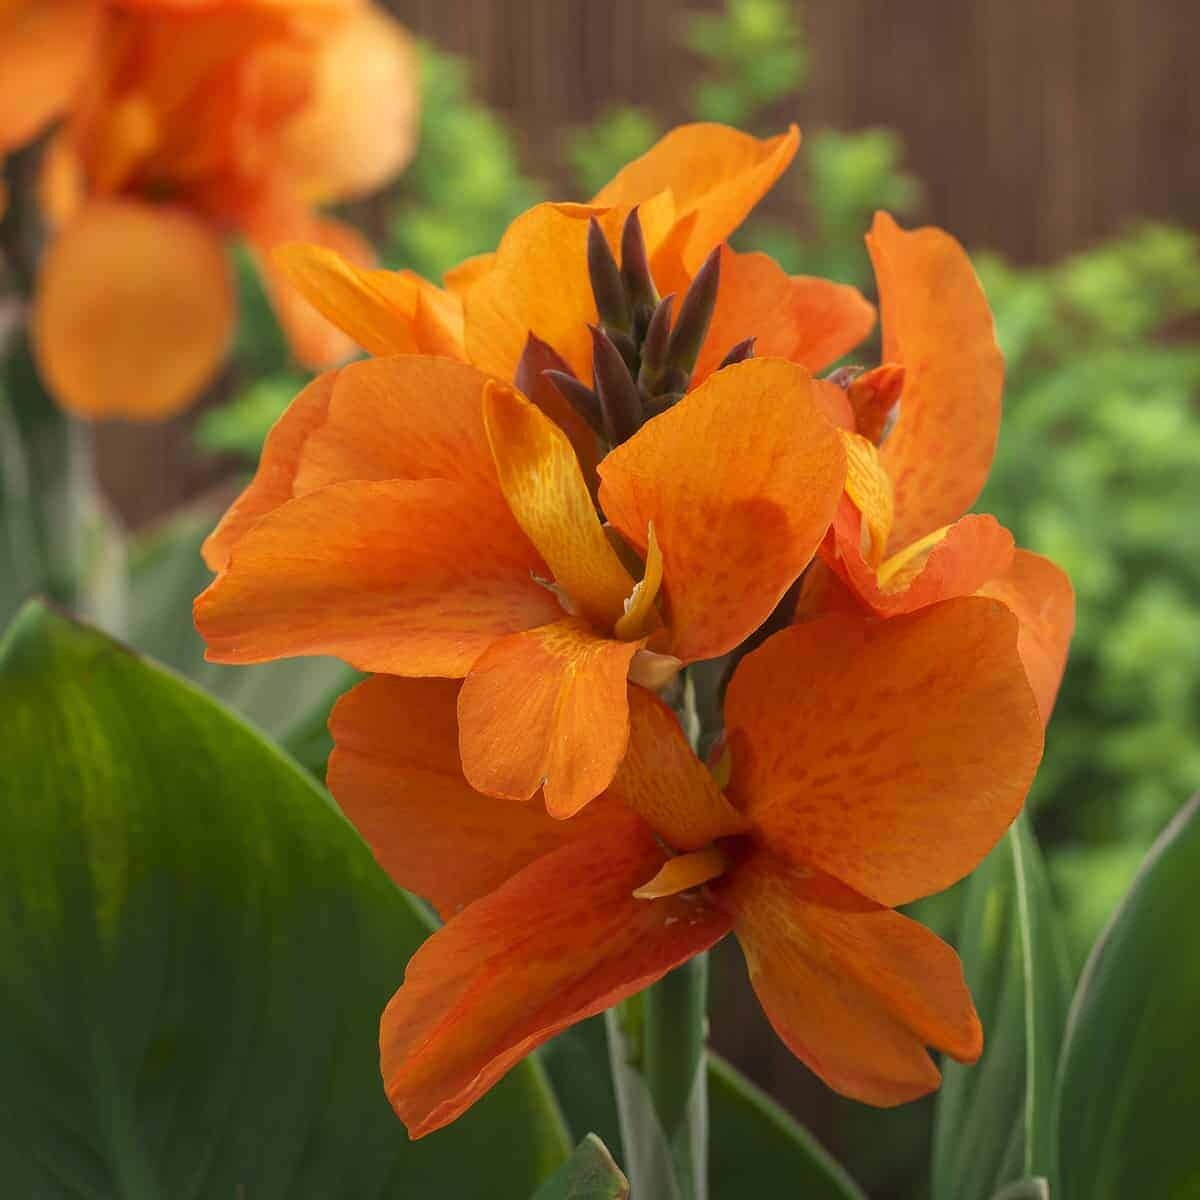 Canna, 'South Pacific Orange'